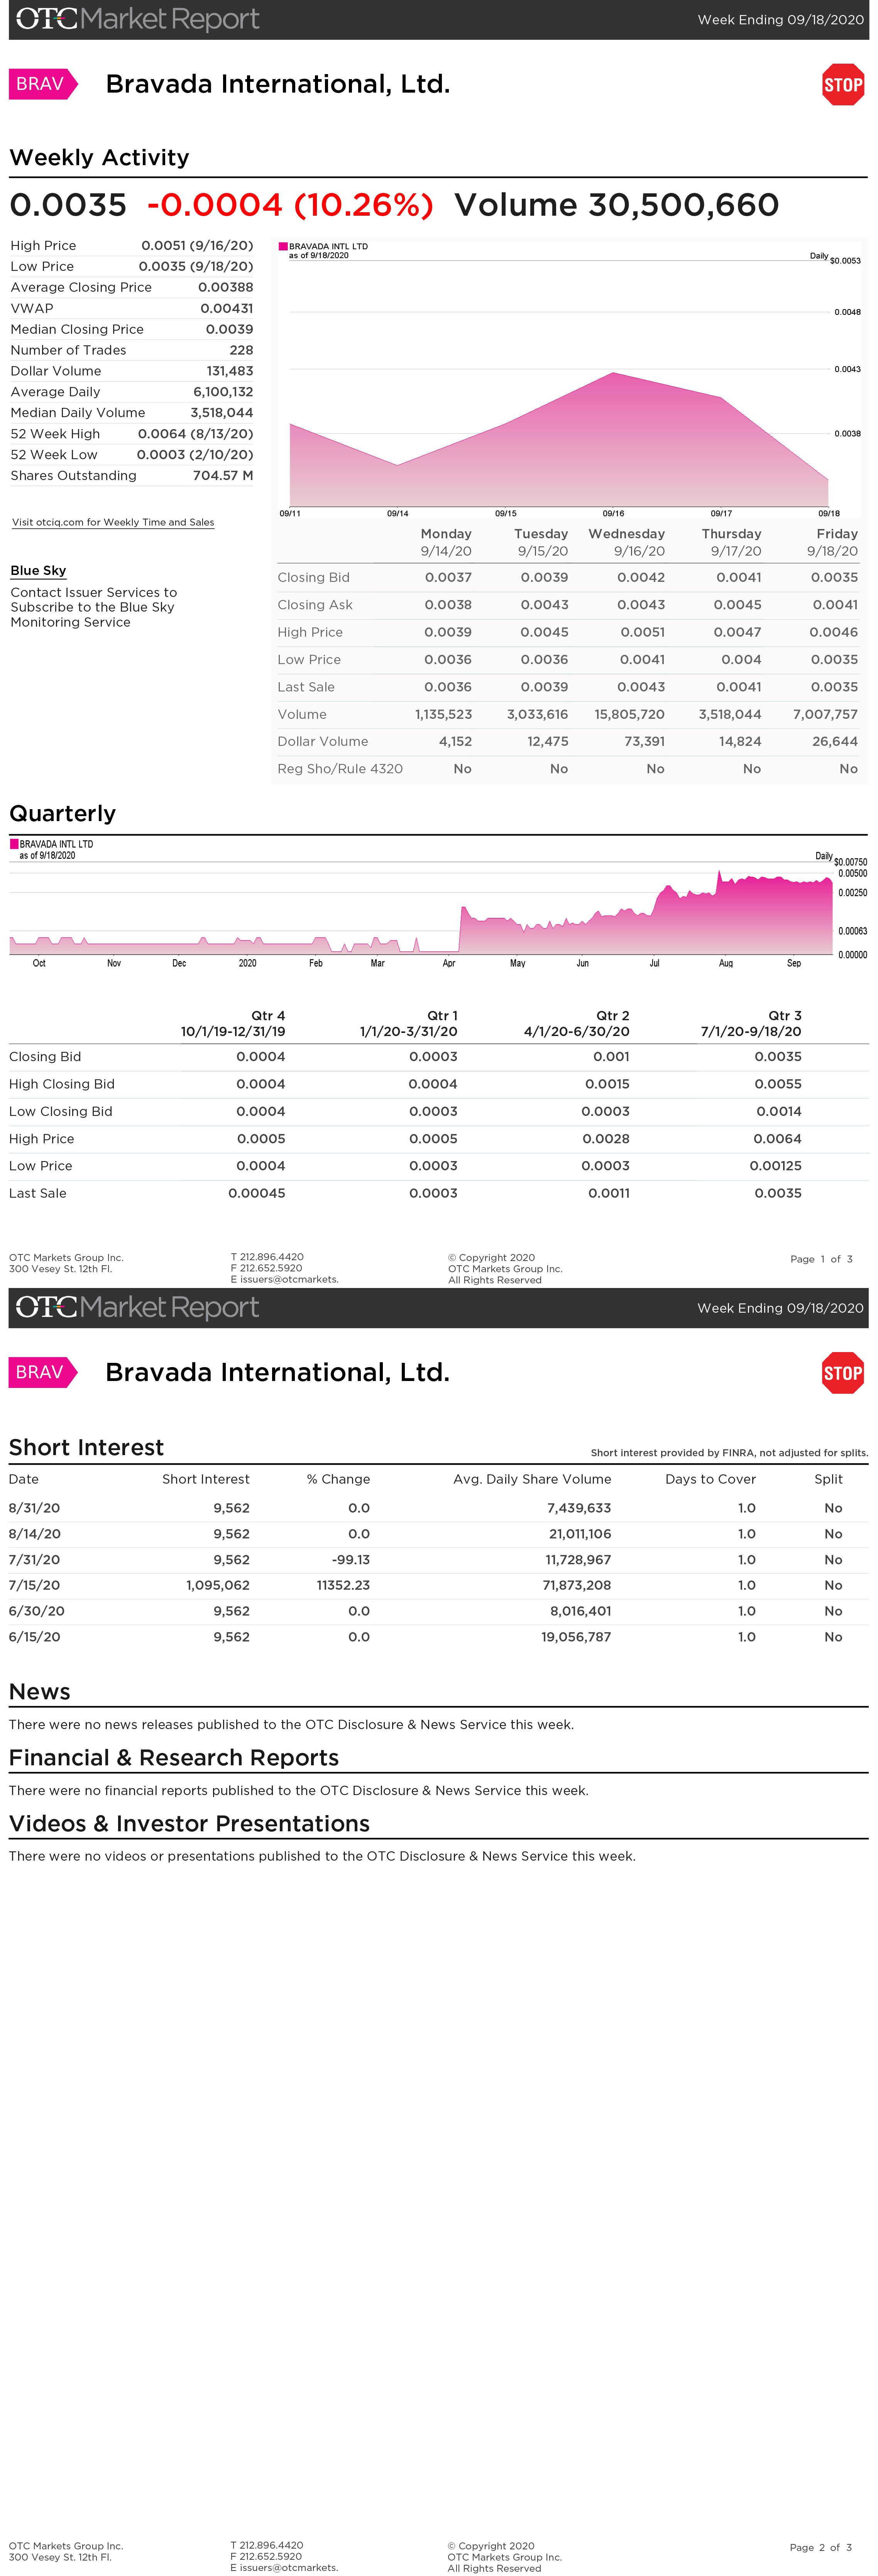 BRAVADA Weekly Trading Summary